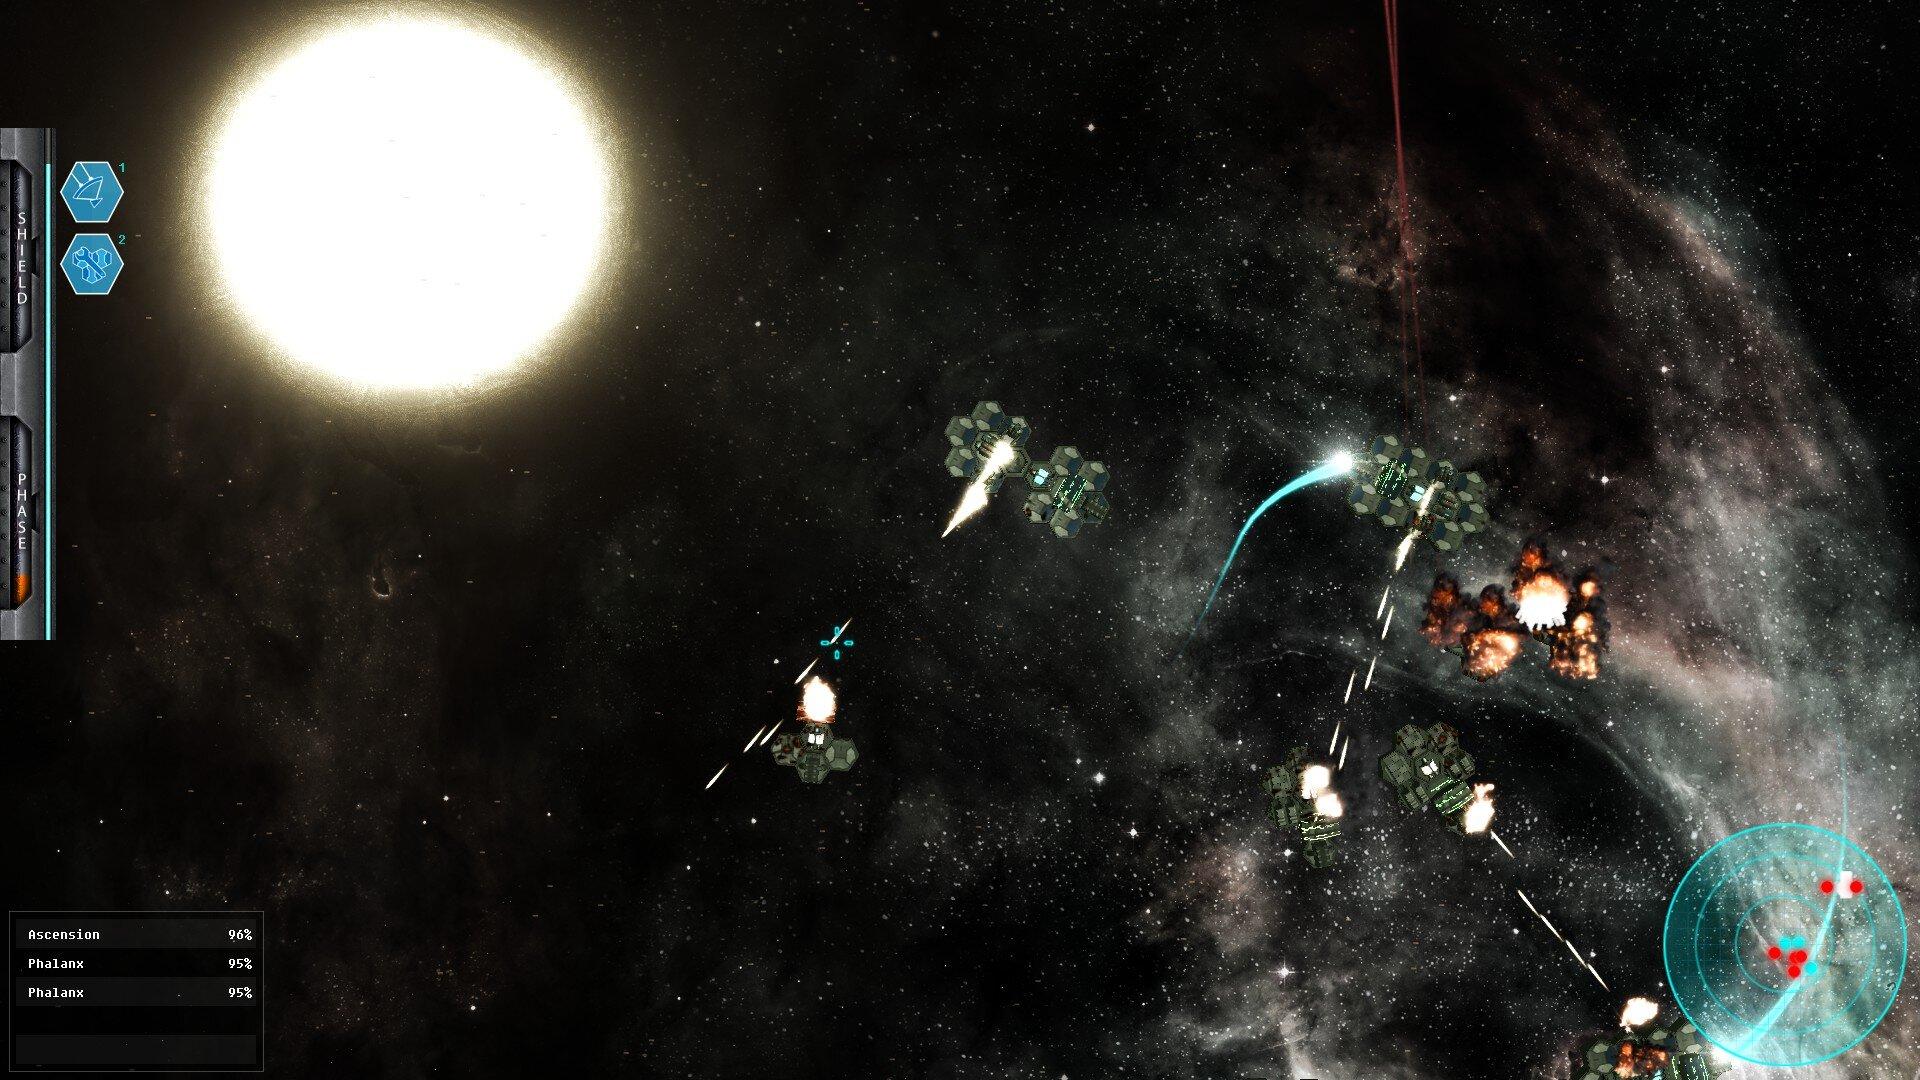 Hexterminate game screenshot, space battle